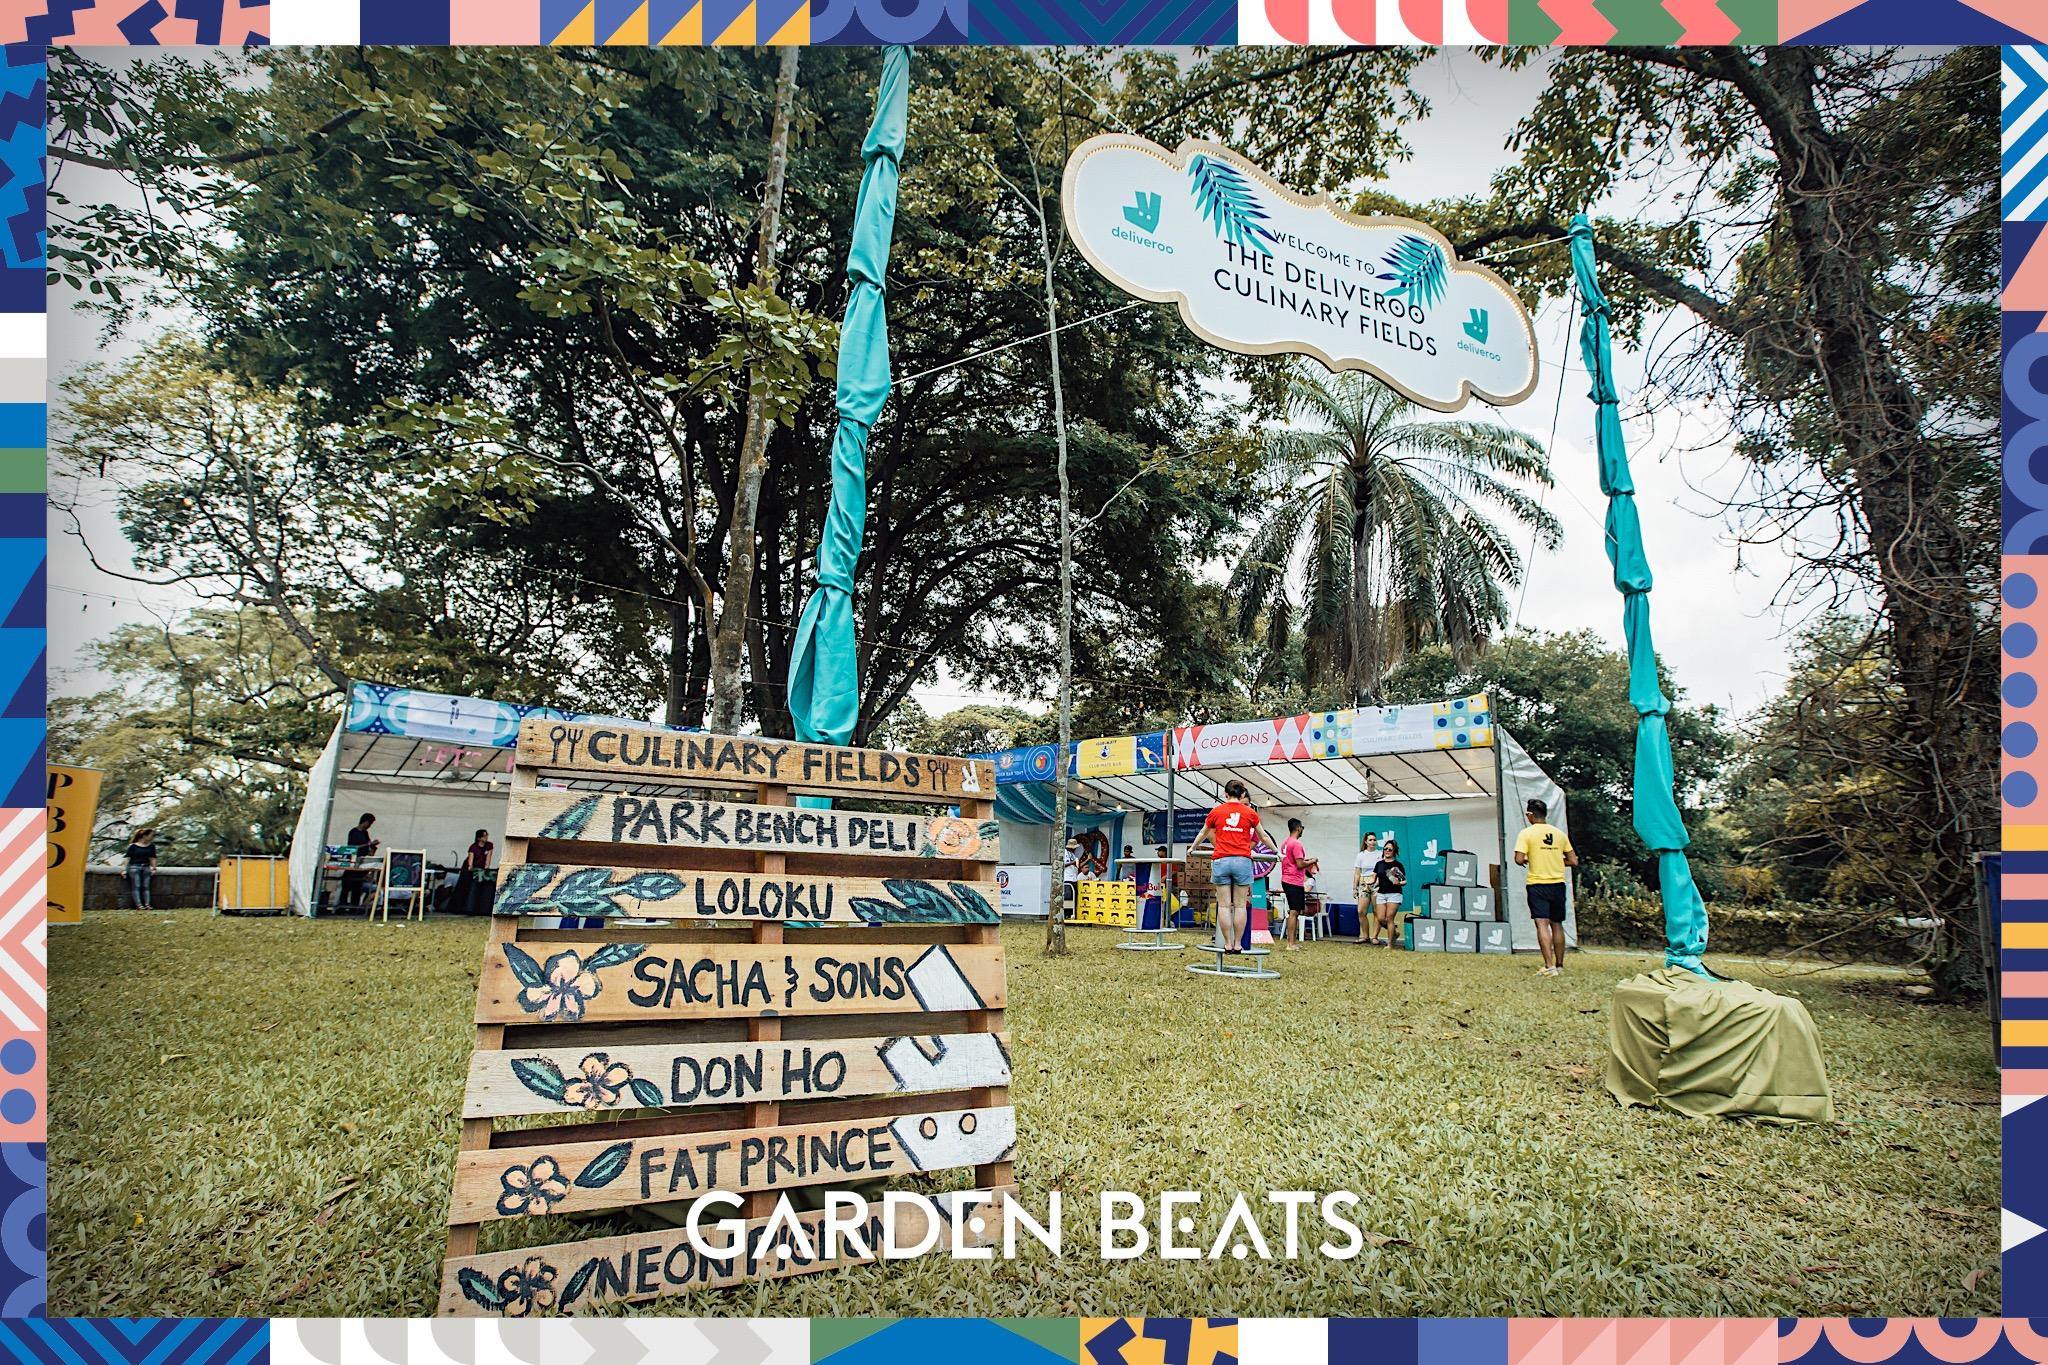 18032017_GardenBeats_Colossal081_WatermarkedGB.jpg